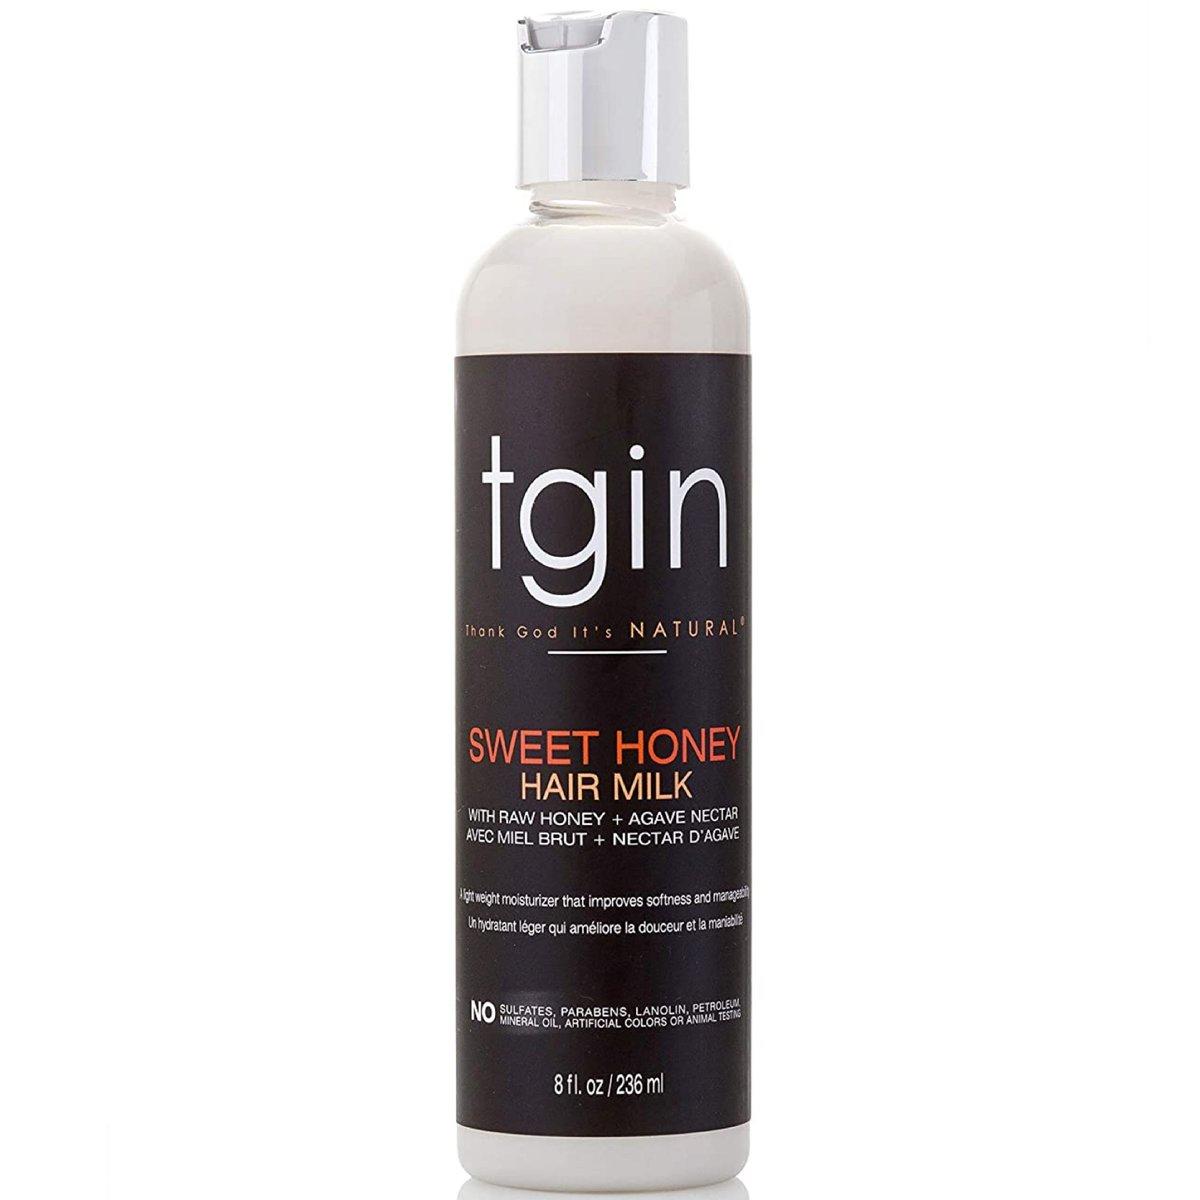 tgin hair milk